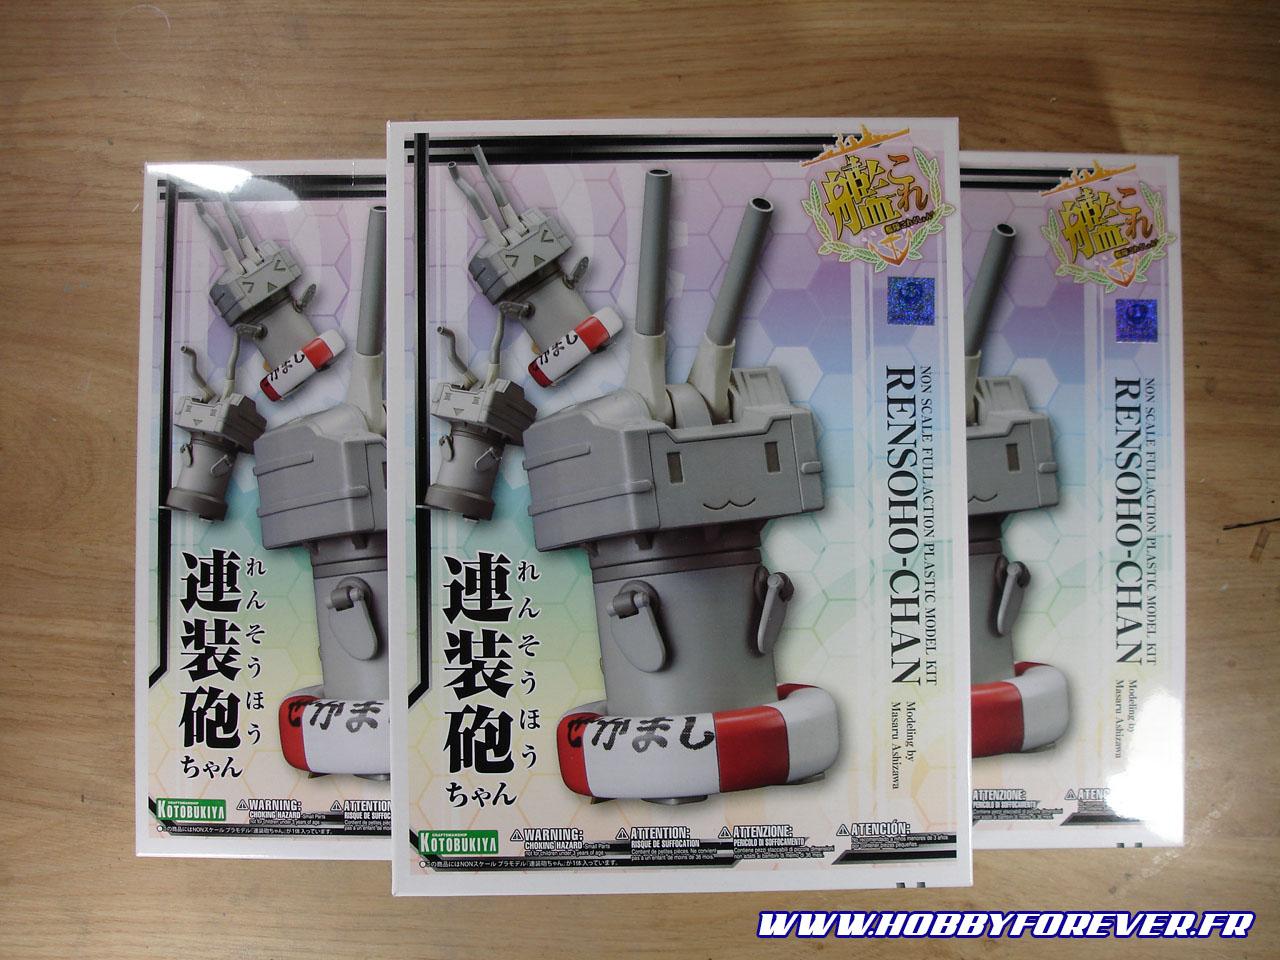 Boite du Rensouhou-chan, en triple exemplaire :p